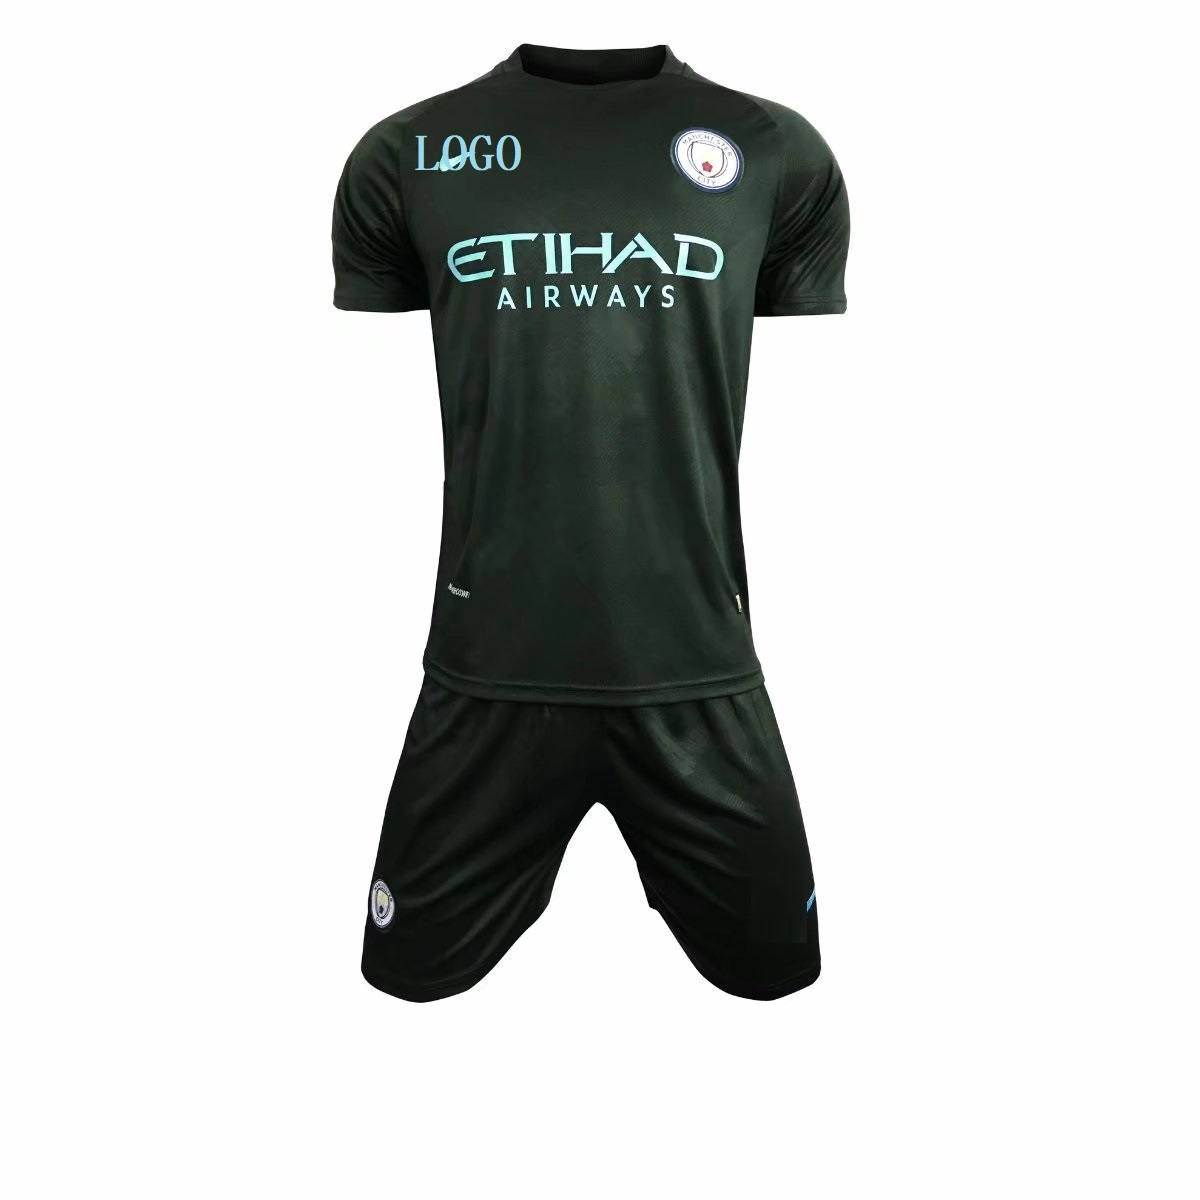 74af63742 Adult Manchester City 2017-18 third Soccer Jersey Uniforms Men Complete  Football Team Kits Item NO  444239